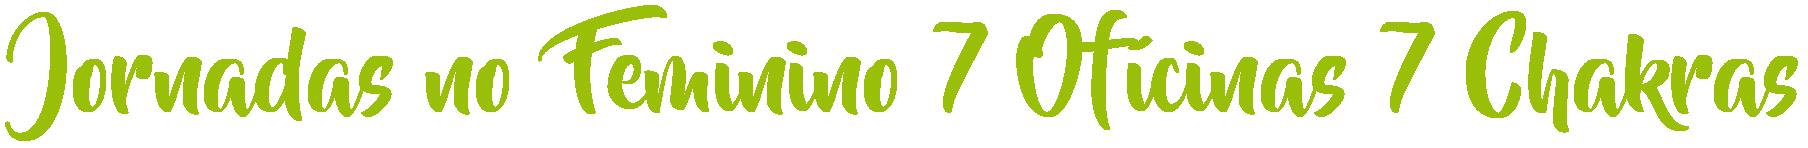 Jornadas no Feminino, 7 Oficinas, 7 Chakras